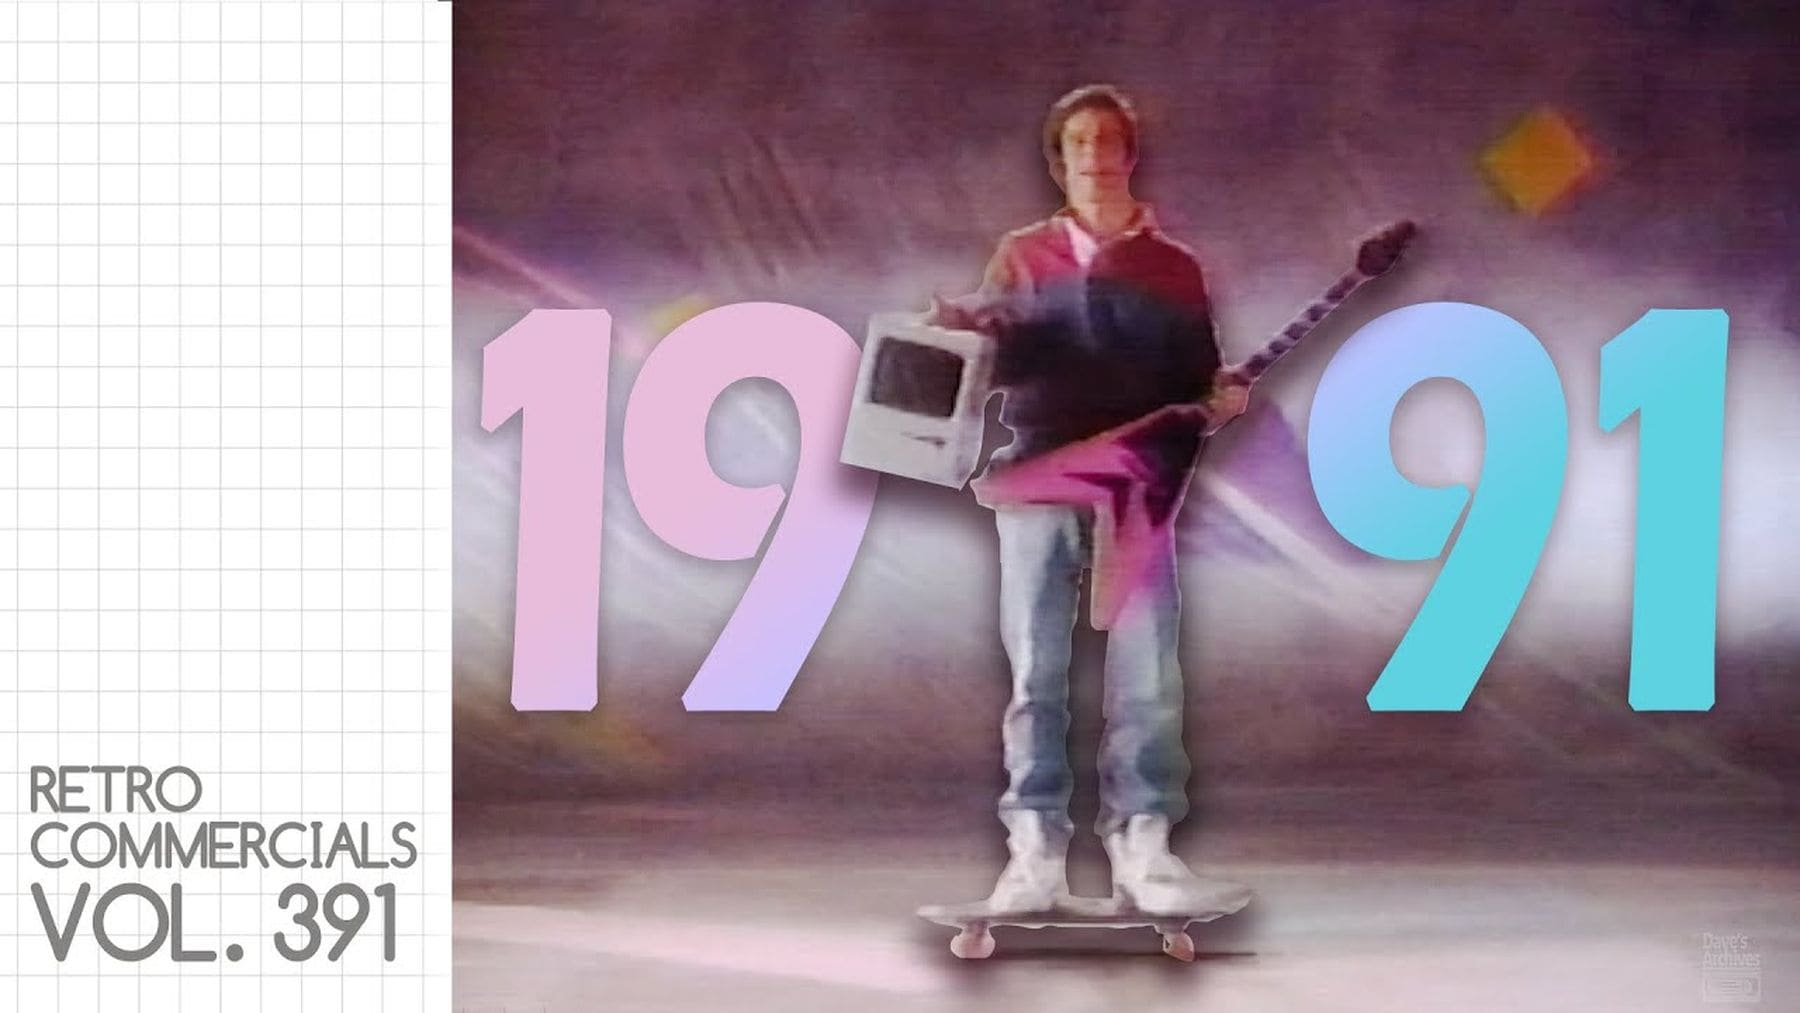 Retro-Werbung von 1991 | Werbung | Was is hier eigentlich los?